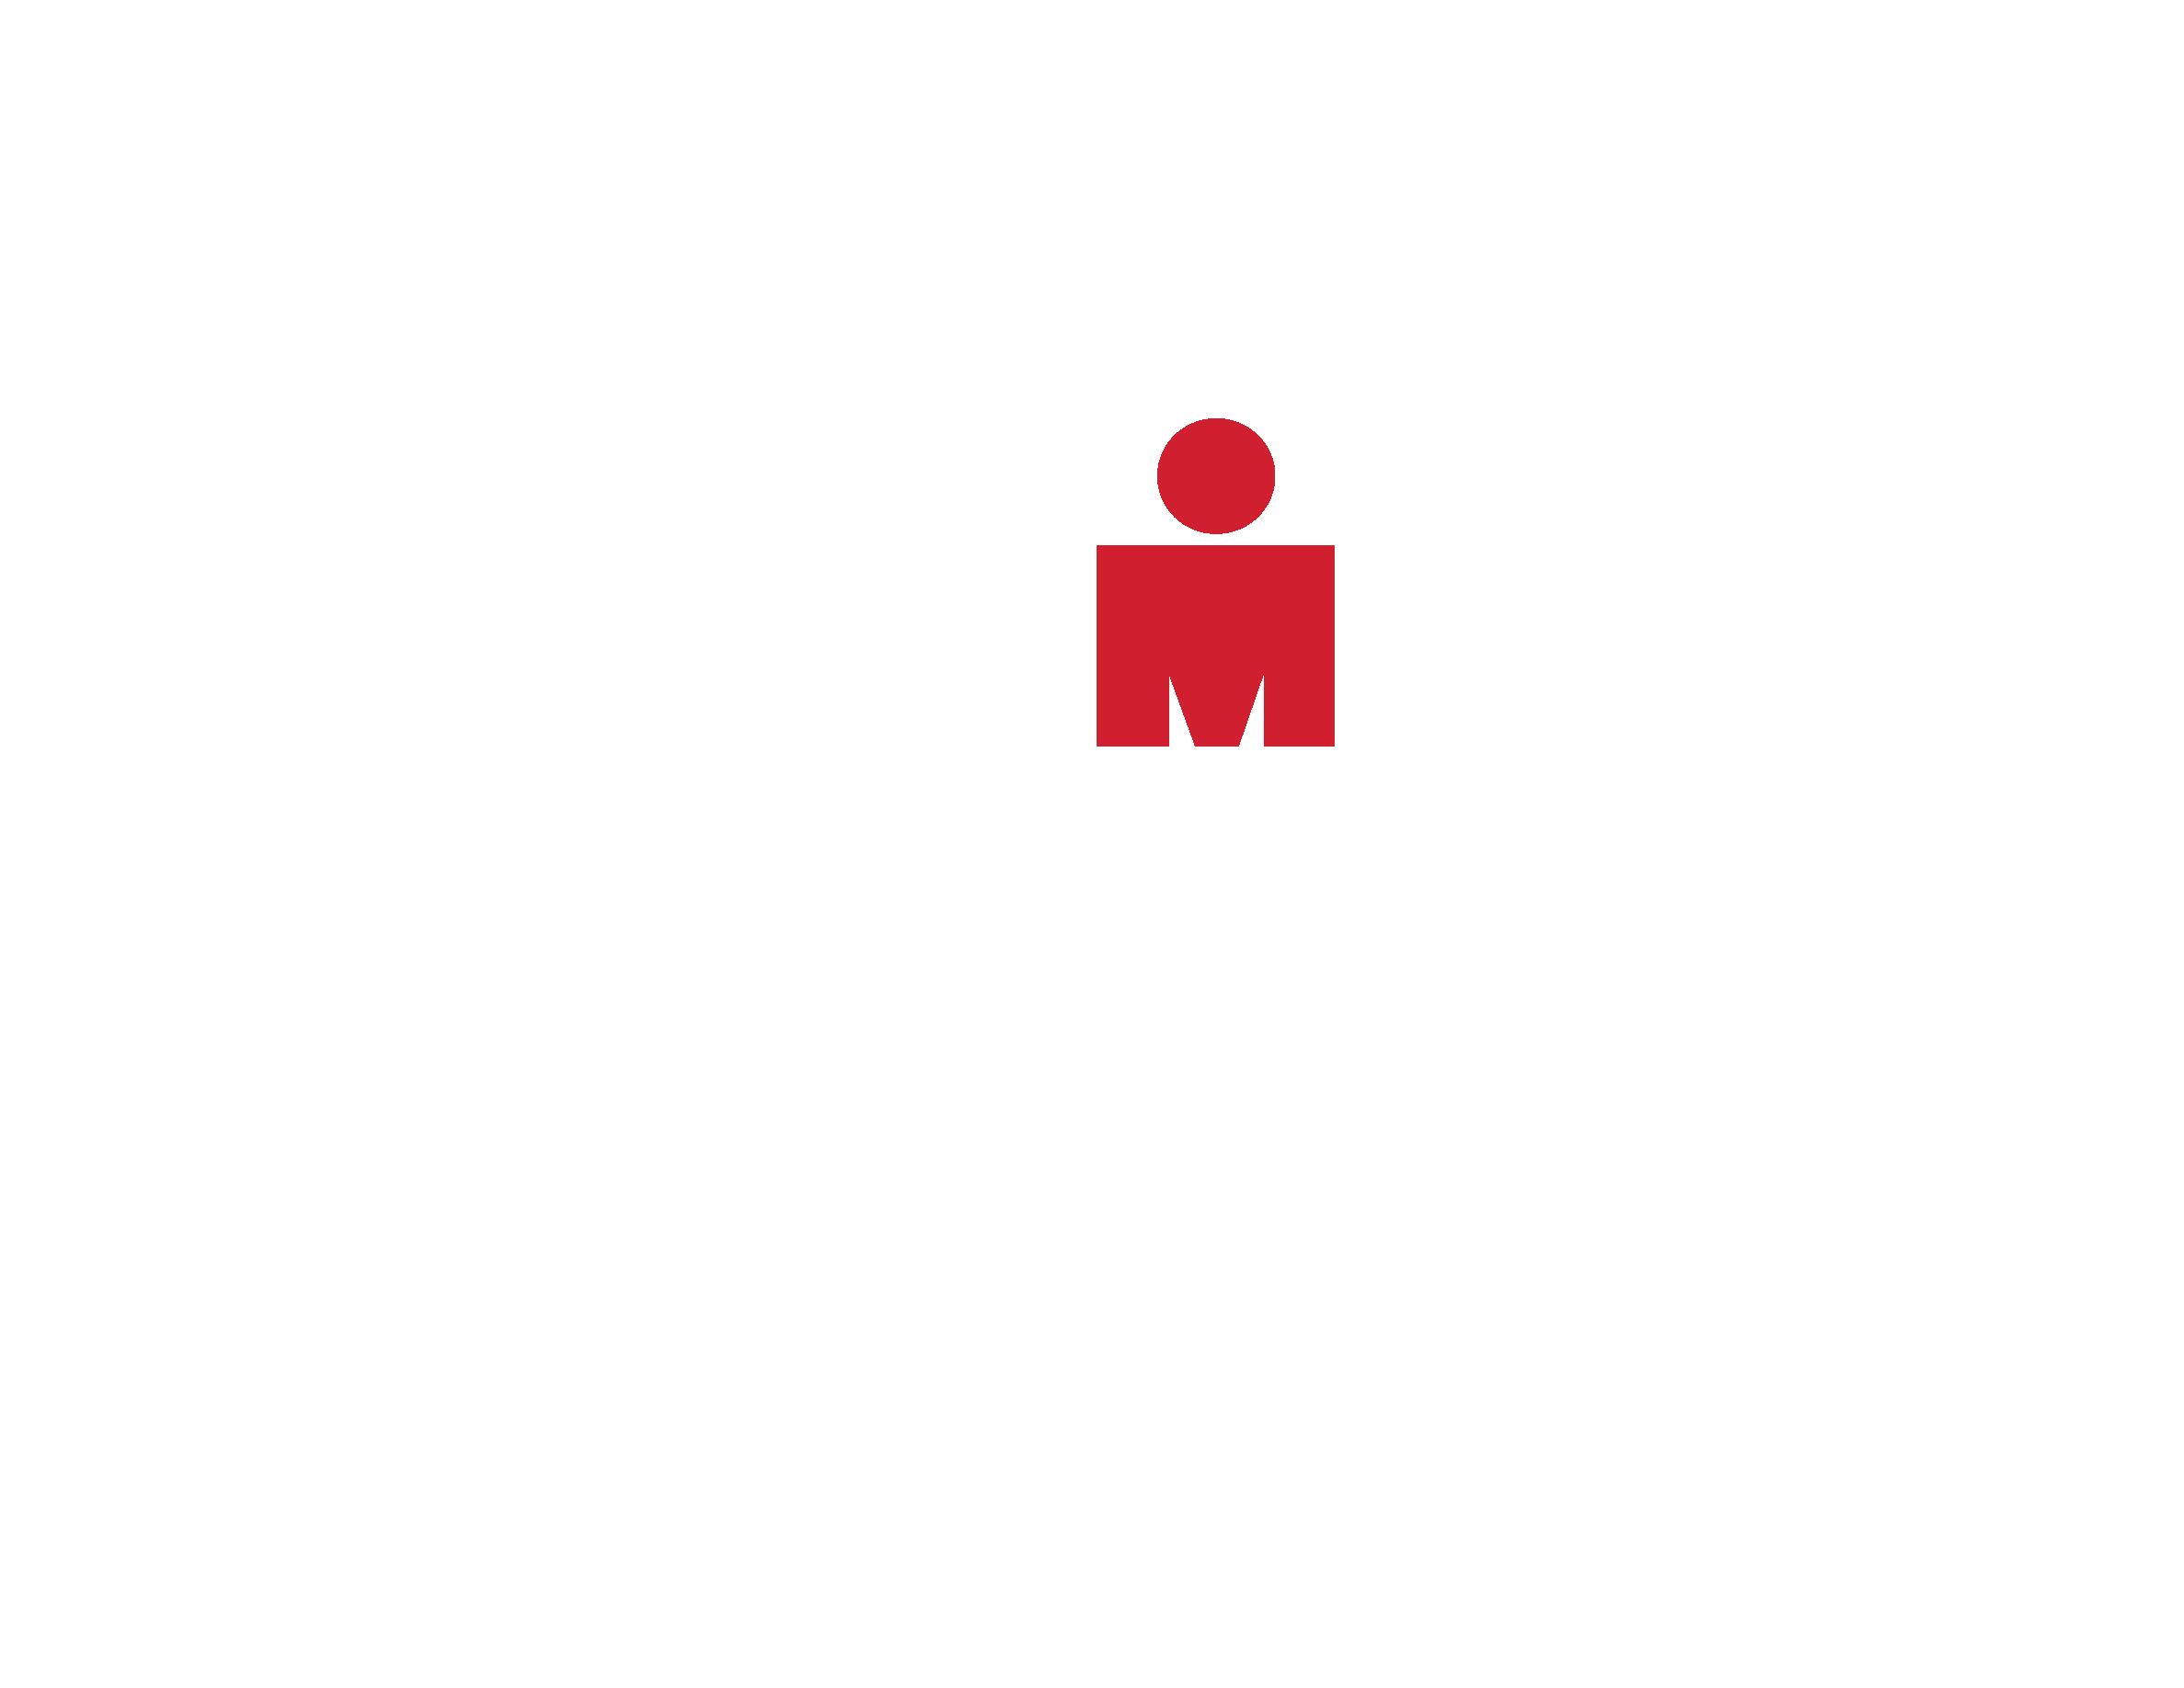 Ironman 2020 Oceania Series Official Hydration Diagnostics Partner